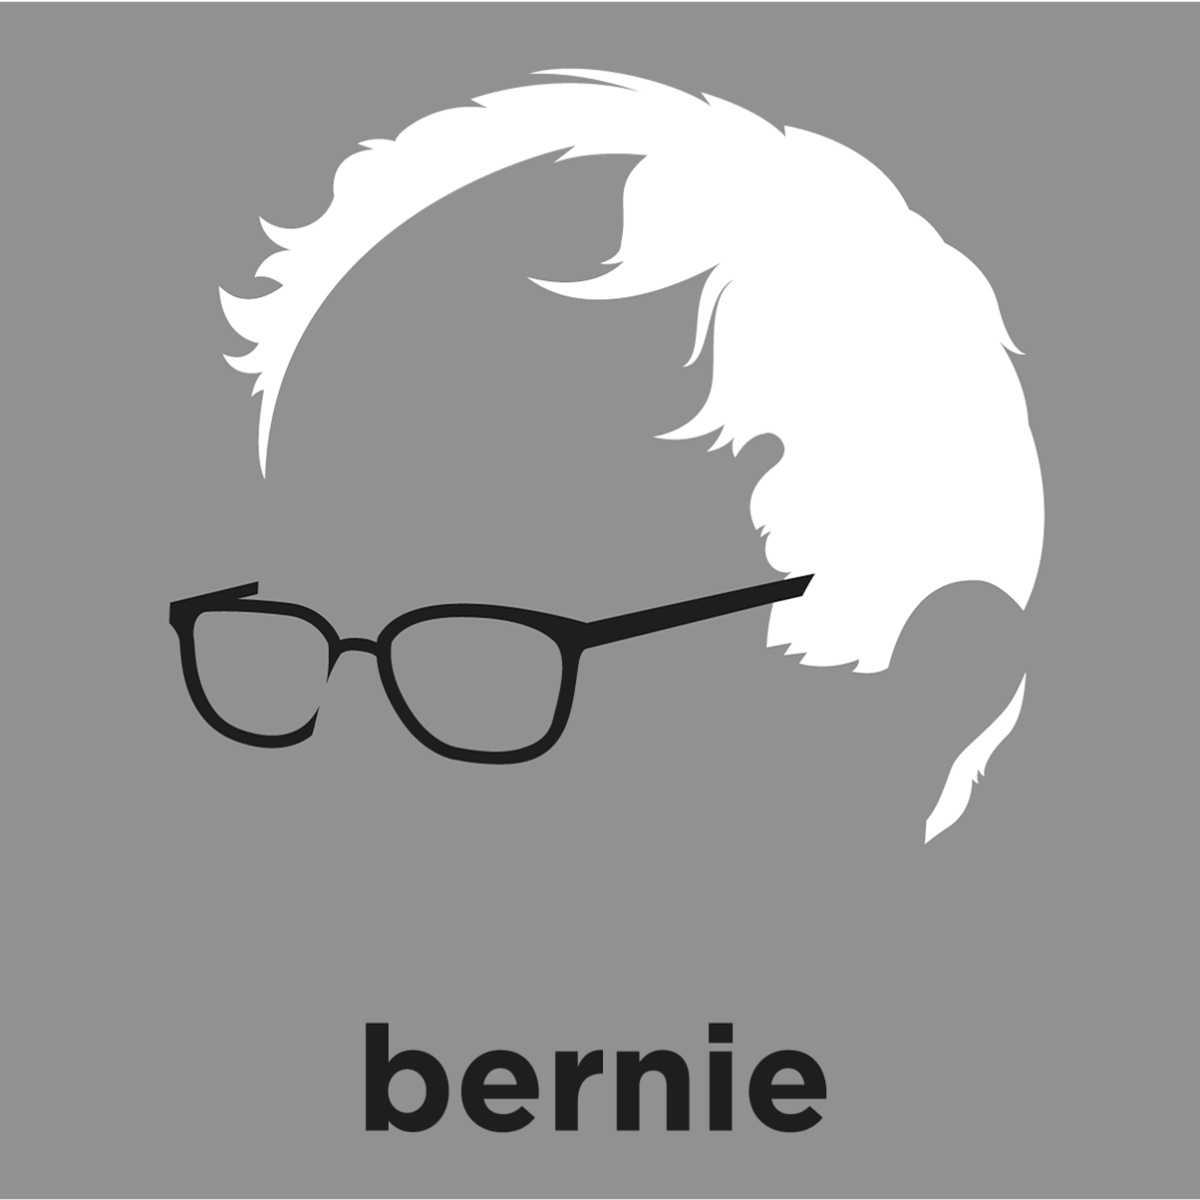 bernie sanders 2016 shirt. a t-shirt with minimalist hair based illustration of bernie sanders: firebrand senator sanders 2016 shirt